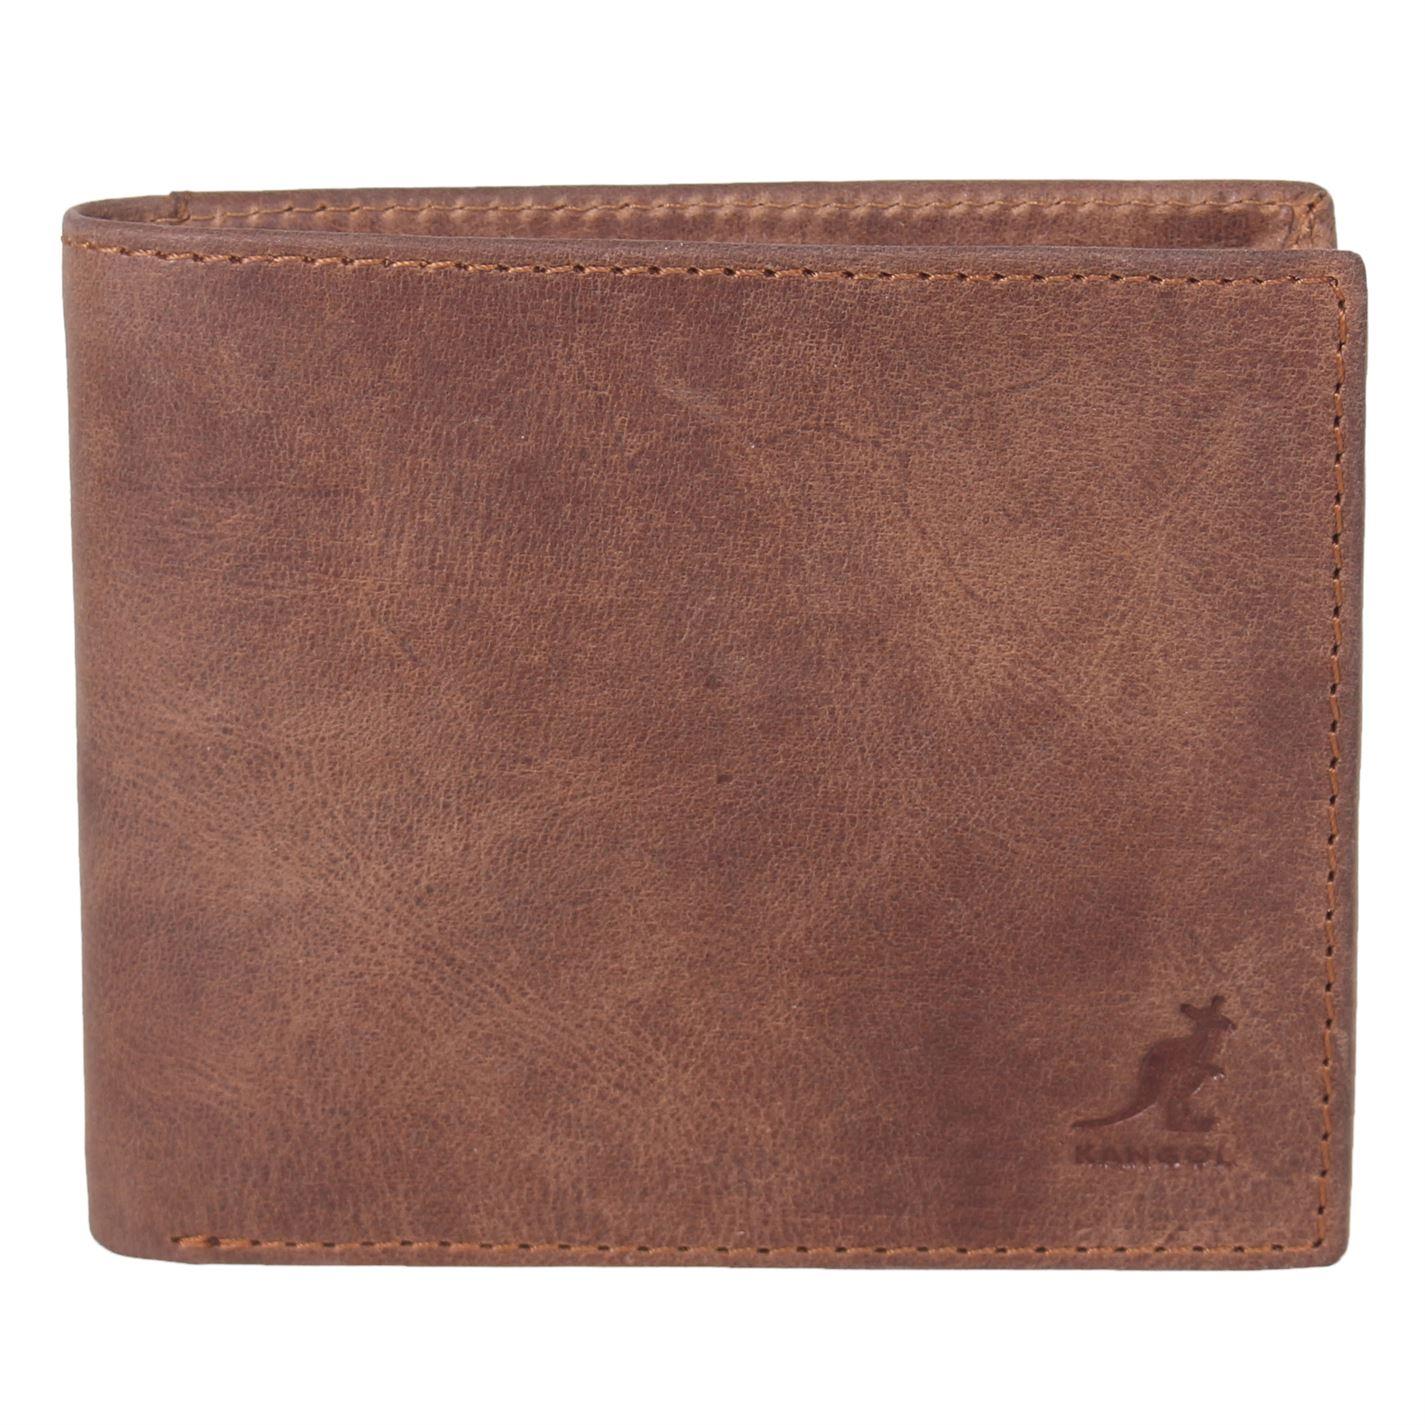 Kangol Patriot Wallet